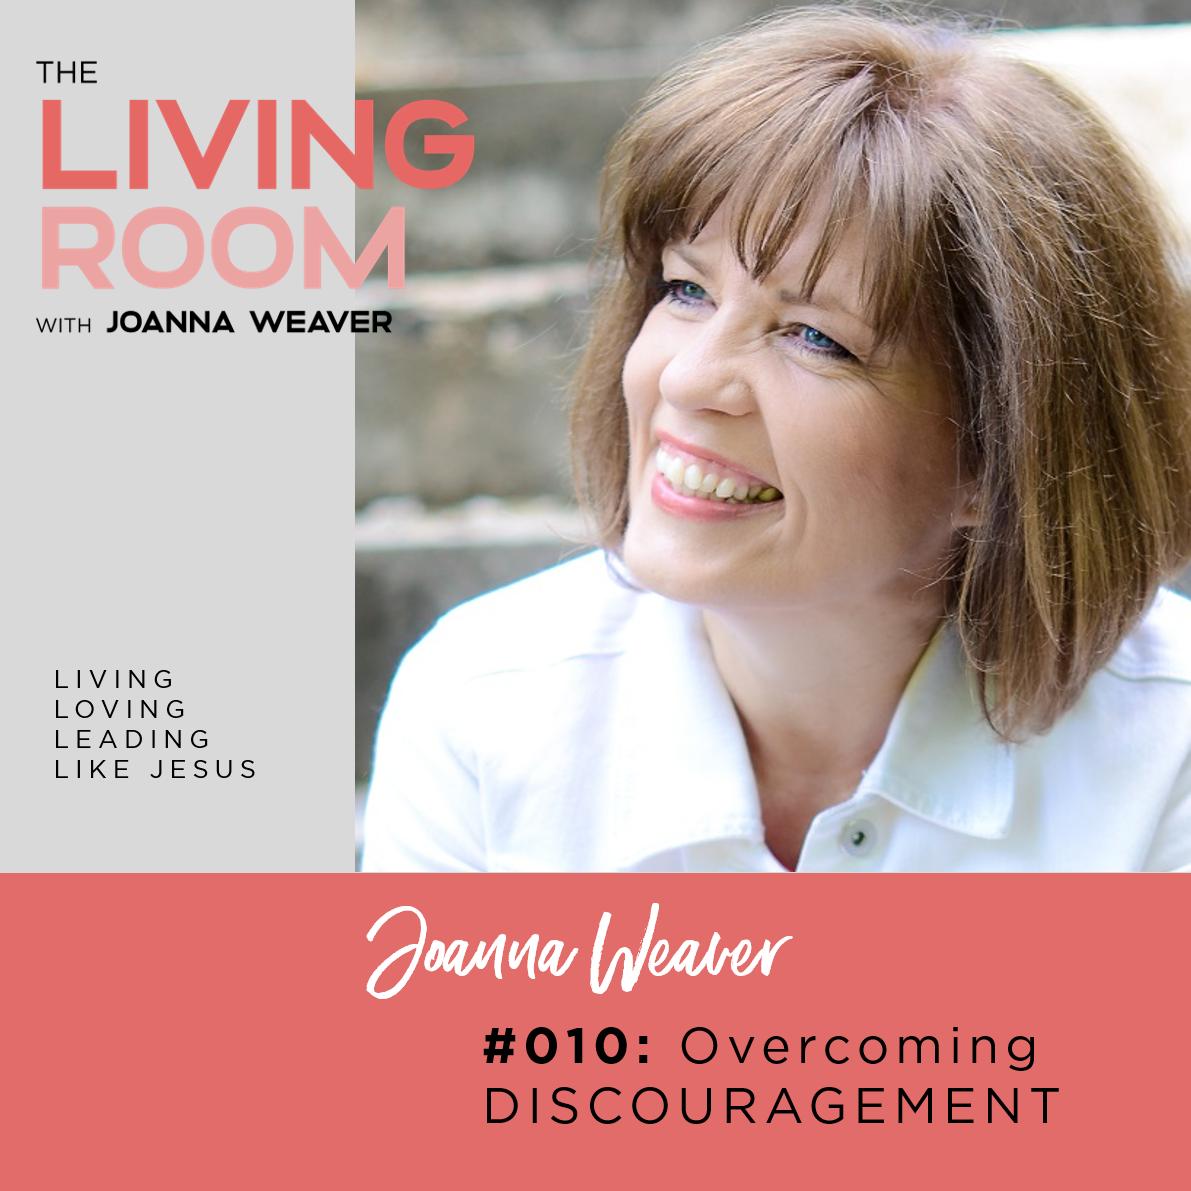 010: Overcoming Discouragement with Joanna Weaver